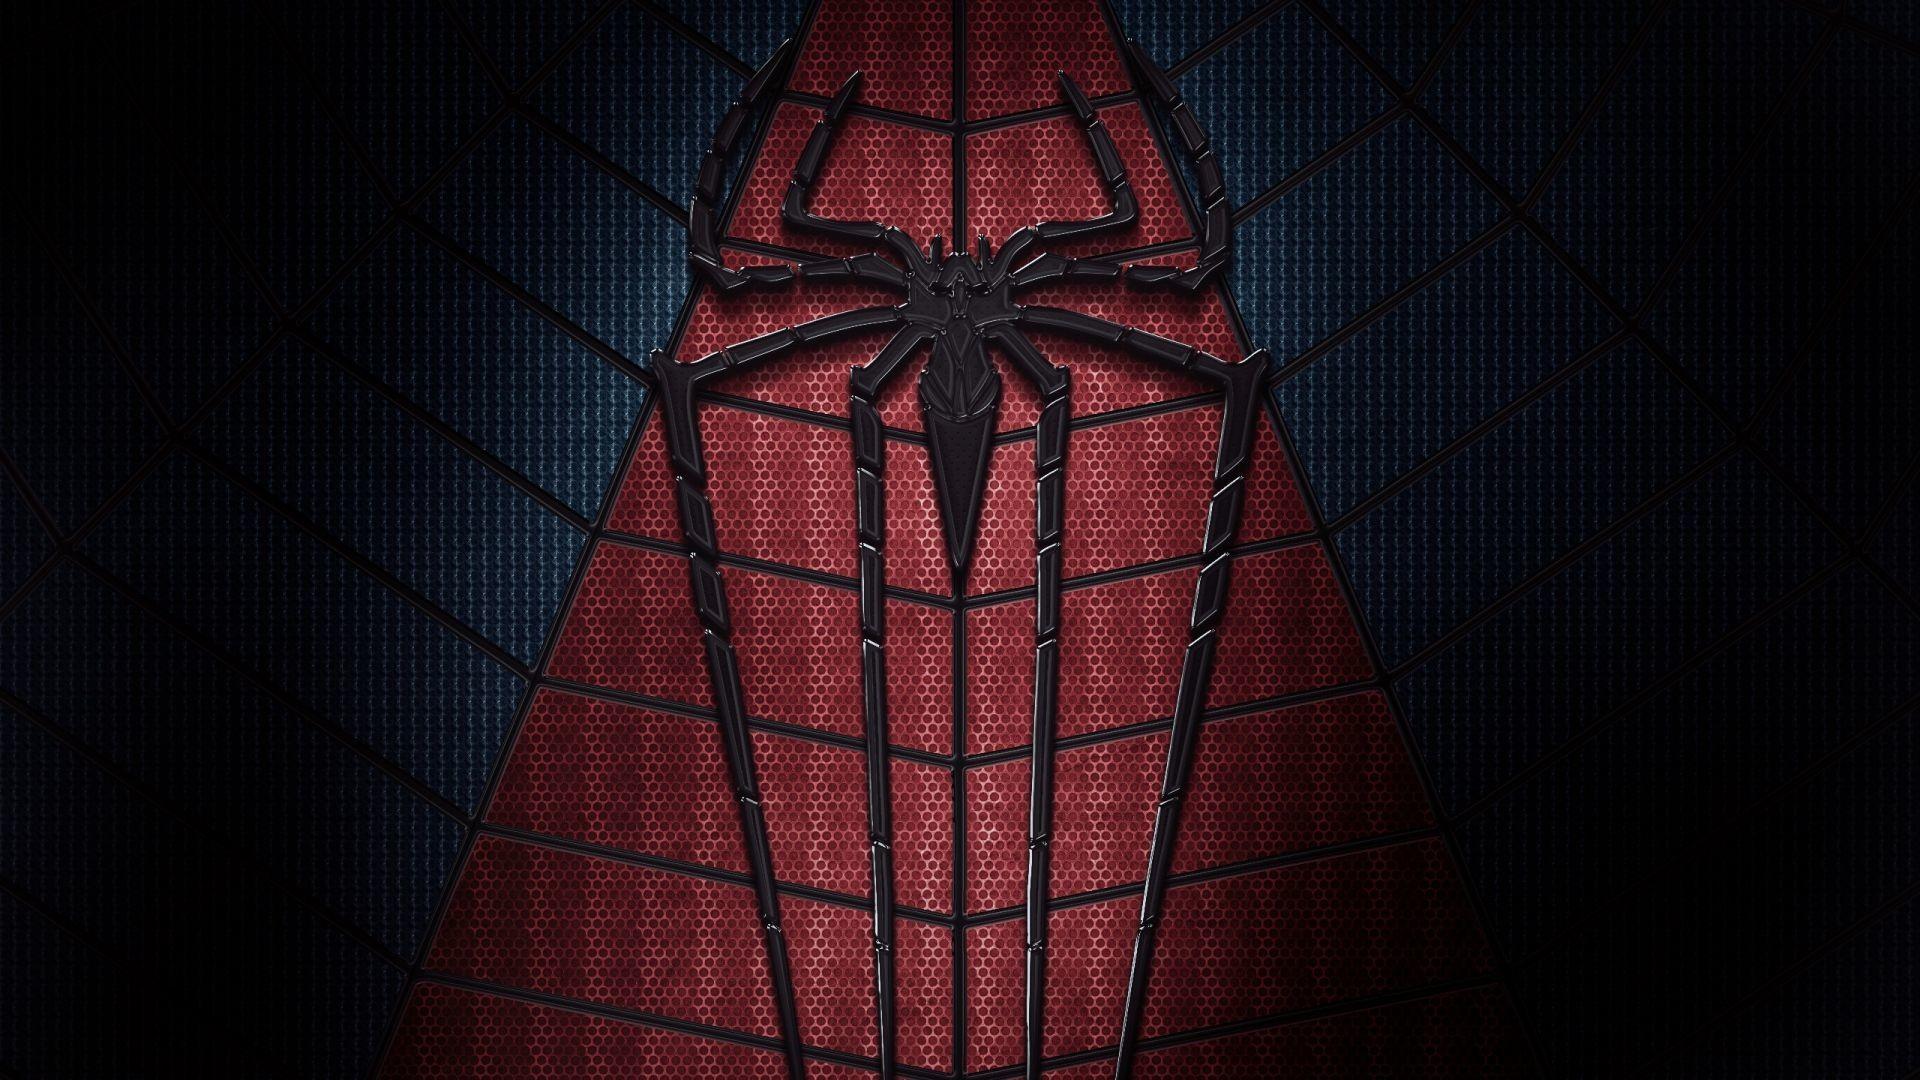 Full HD Wallpaper the amazing spider man comics suit logo, Desktop .